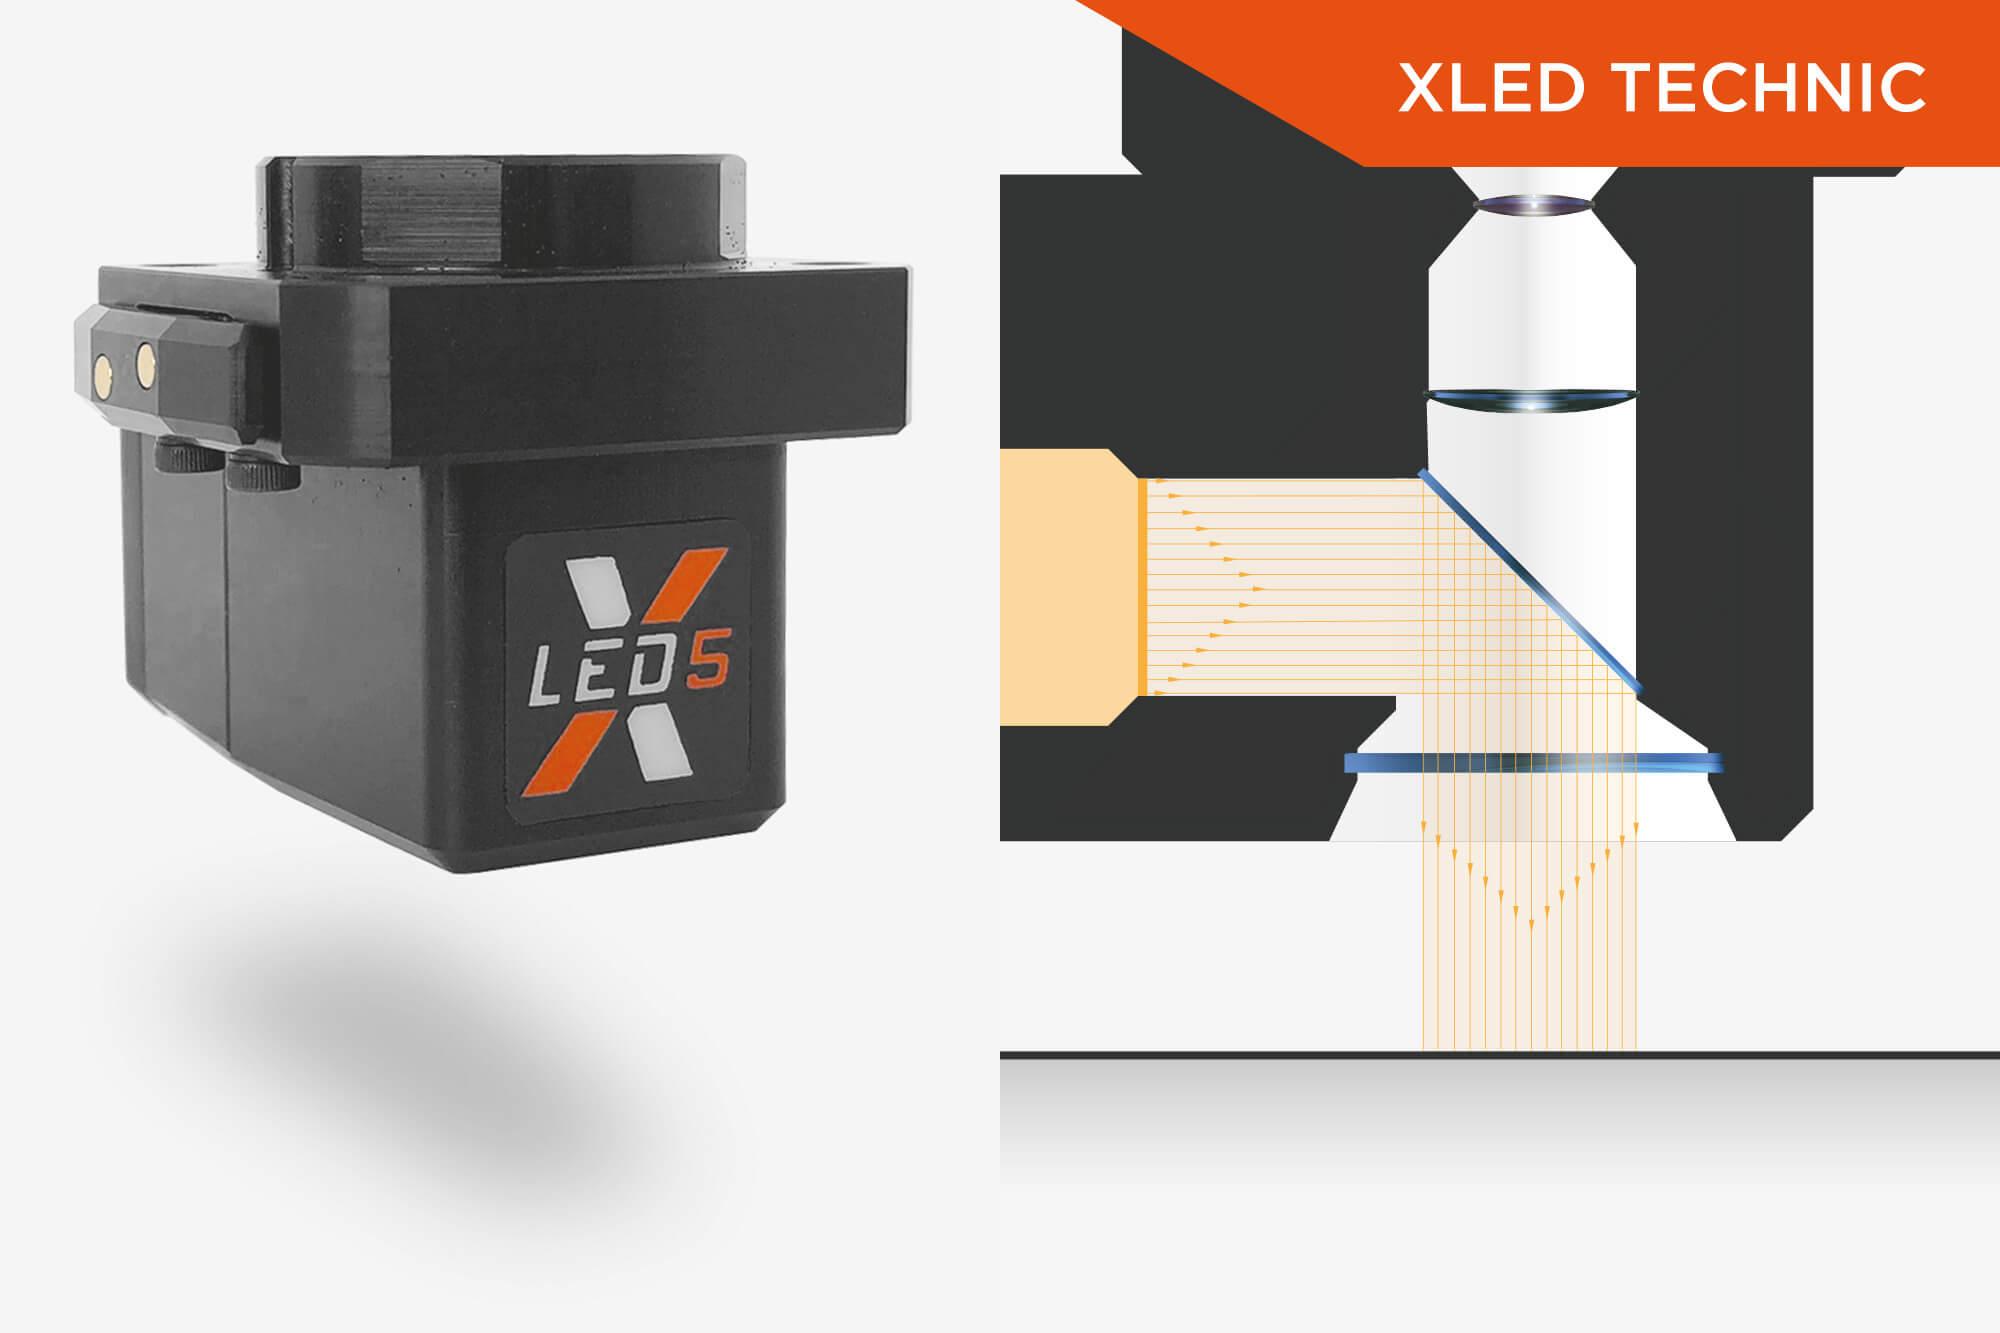 hardness-tester-evo-xled-brinell-evaluation-lenses